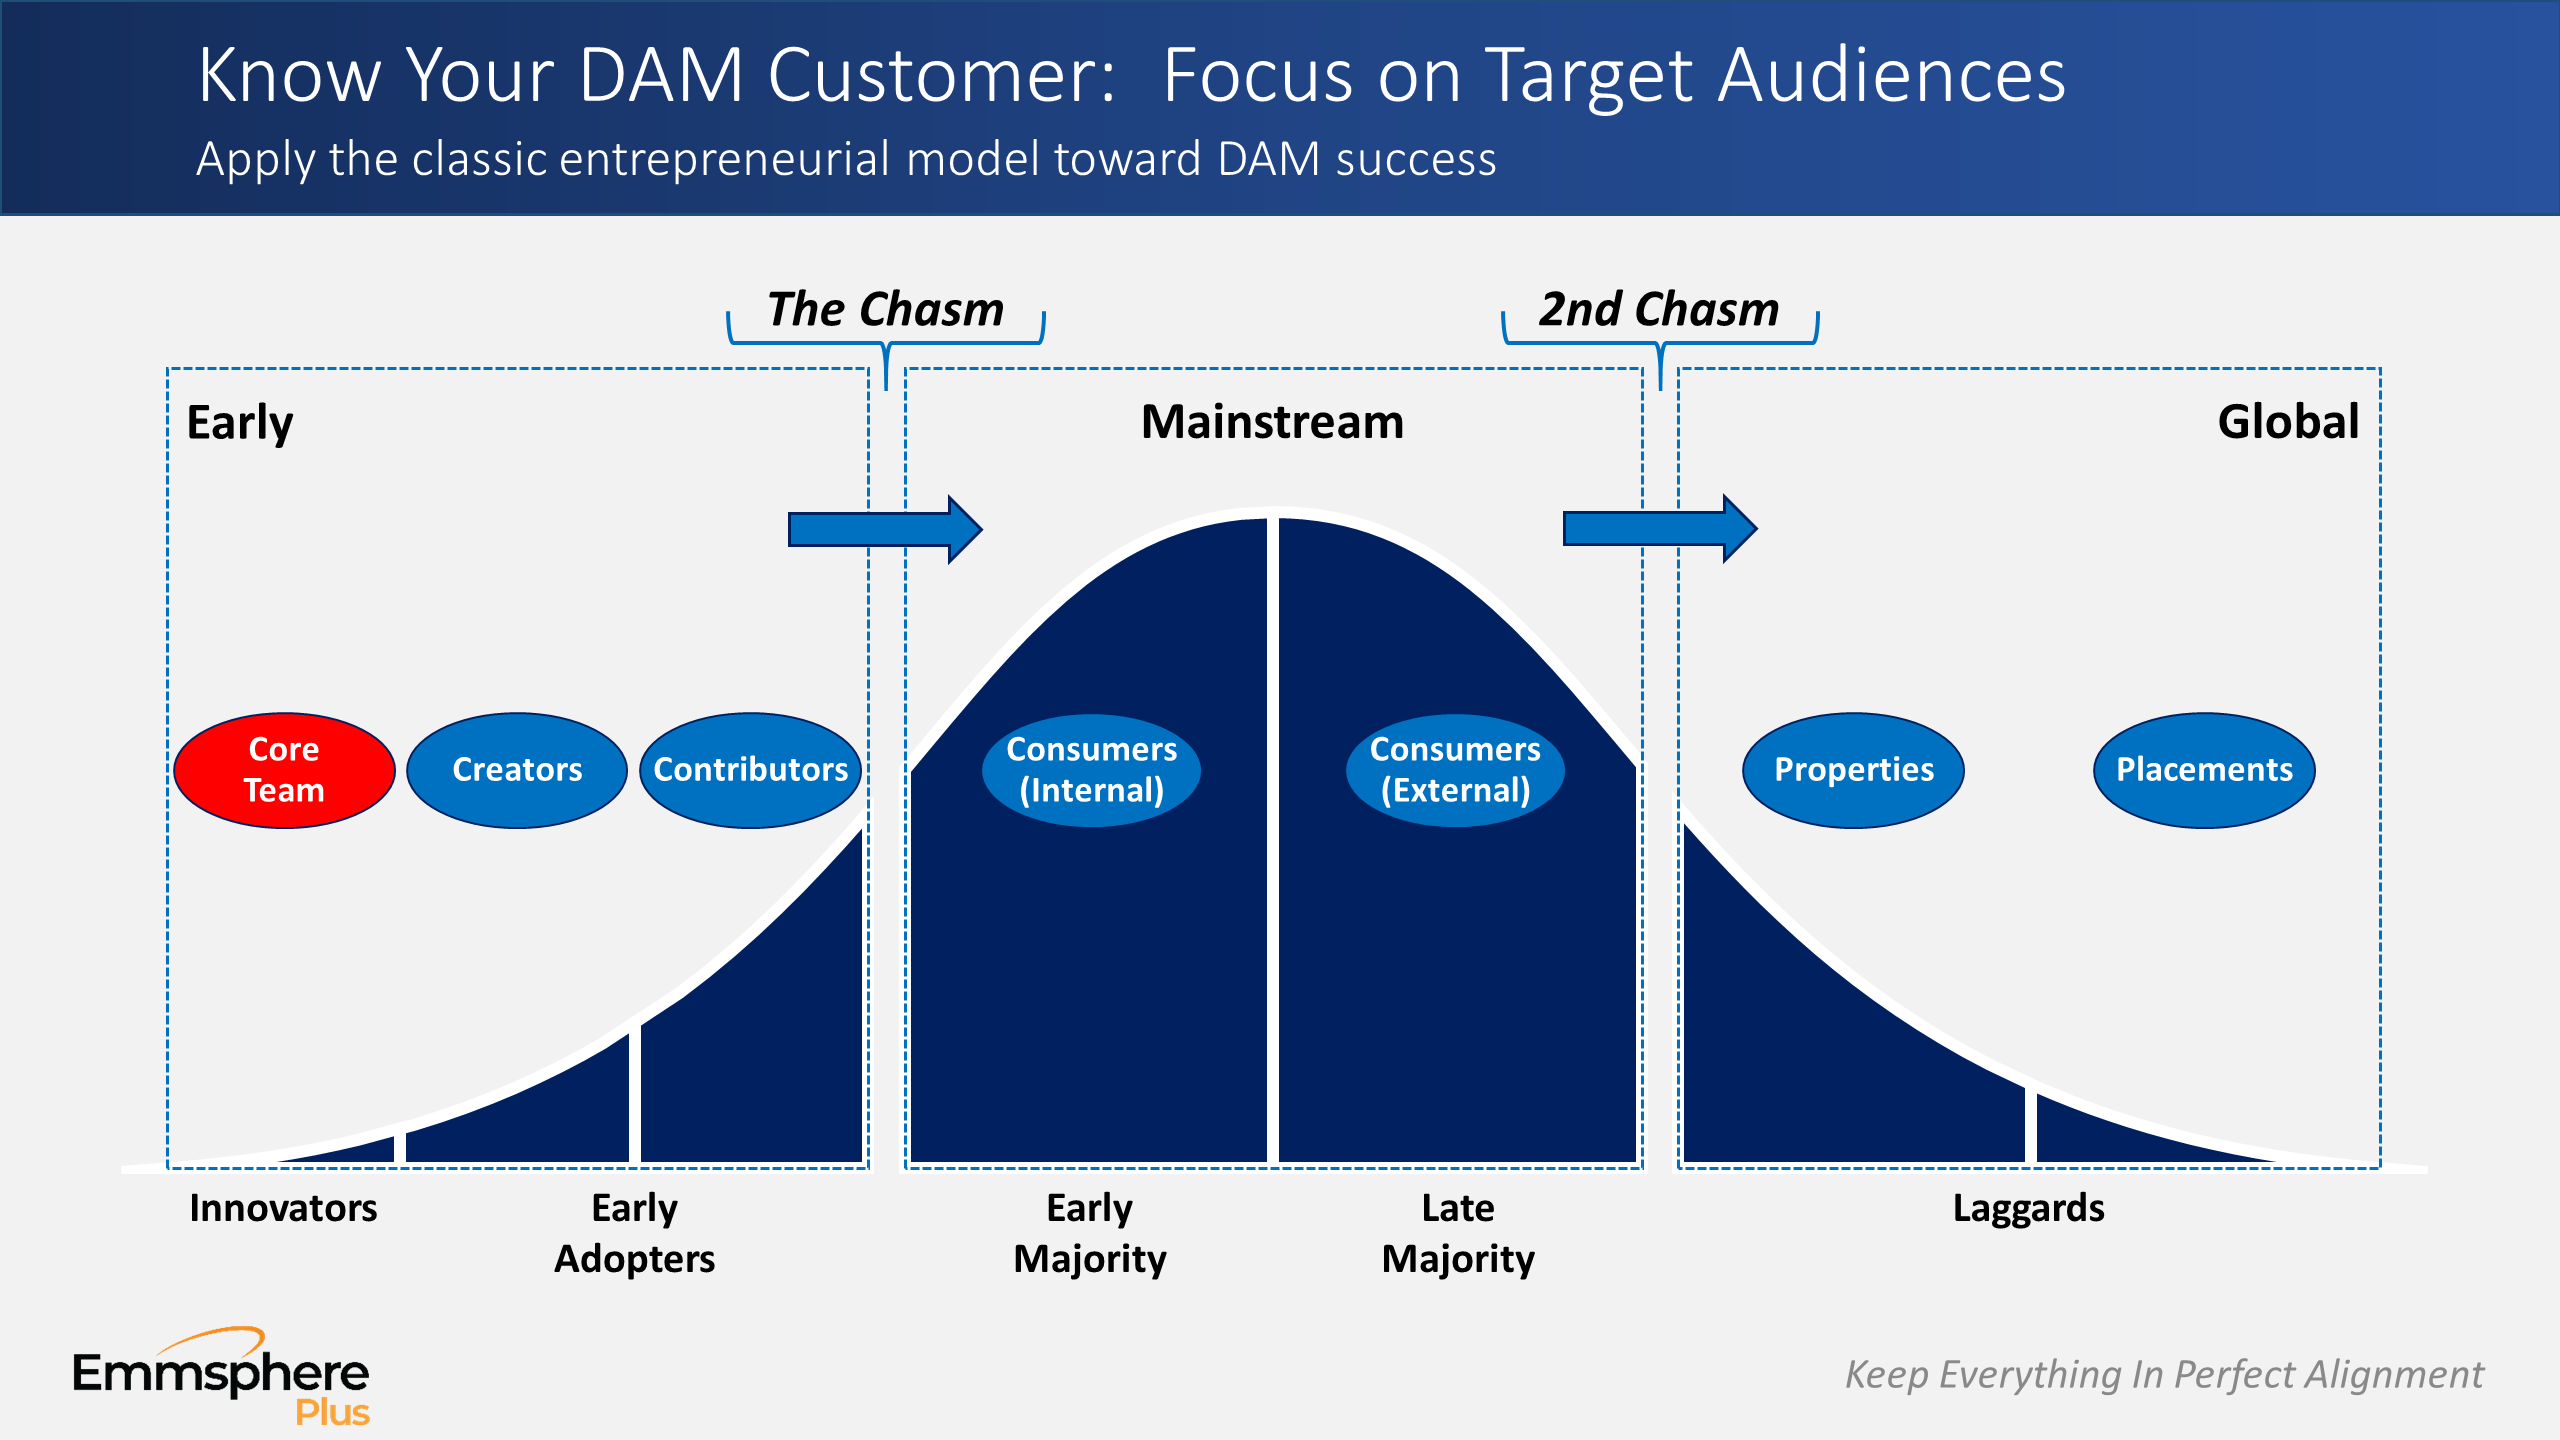 DAM Perspectives Part 3 – Target Audiences